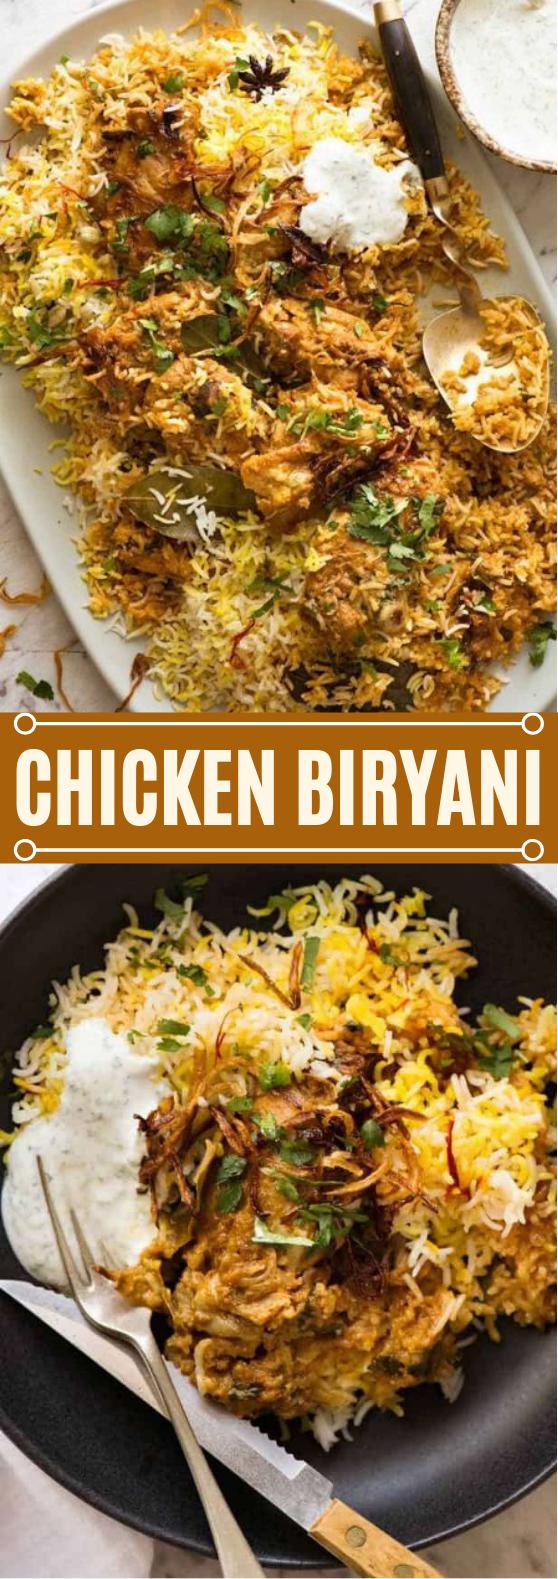 Chicken Biryani #dinner #recipes